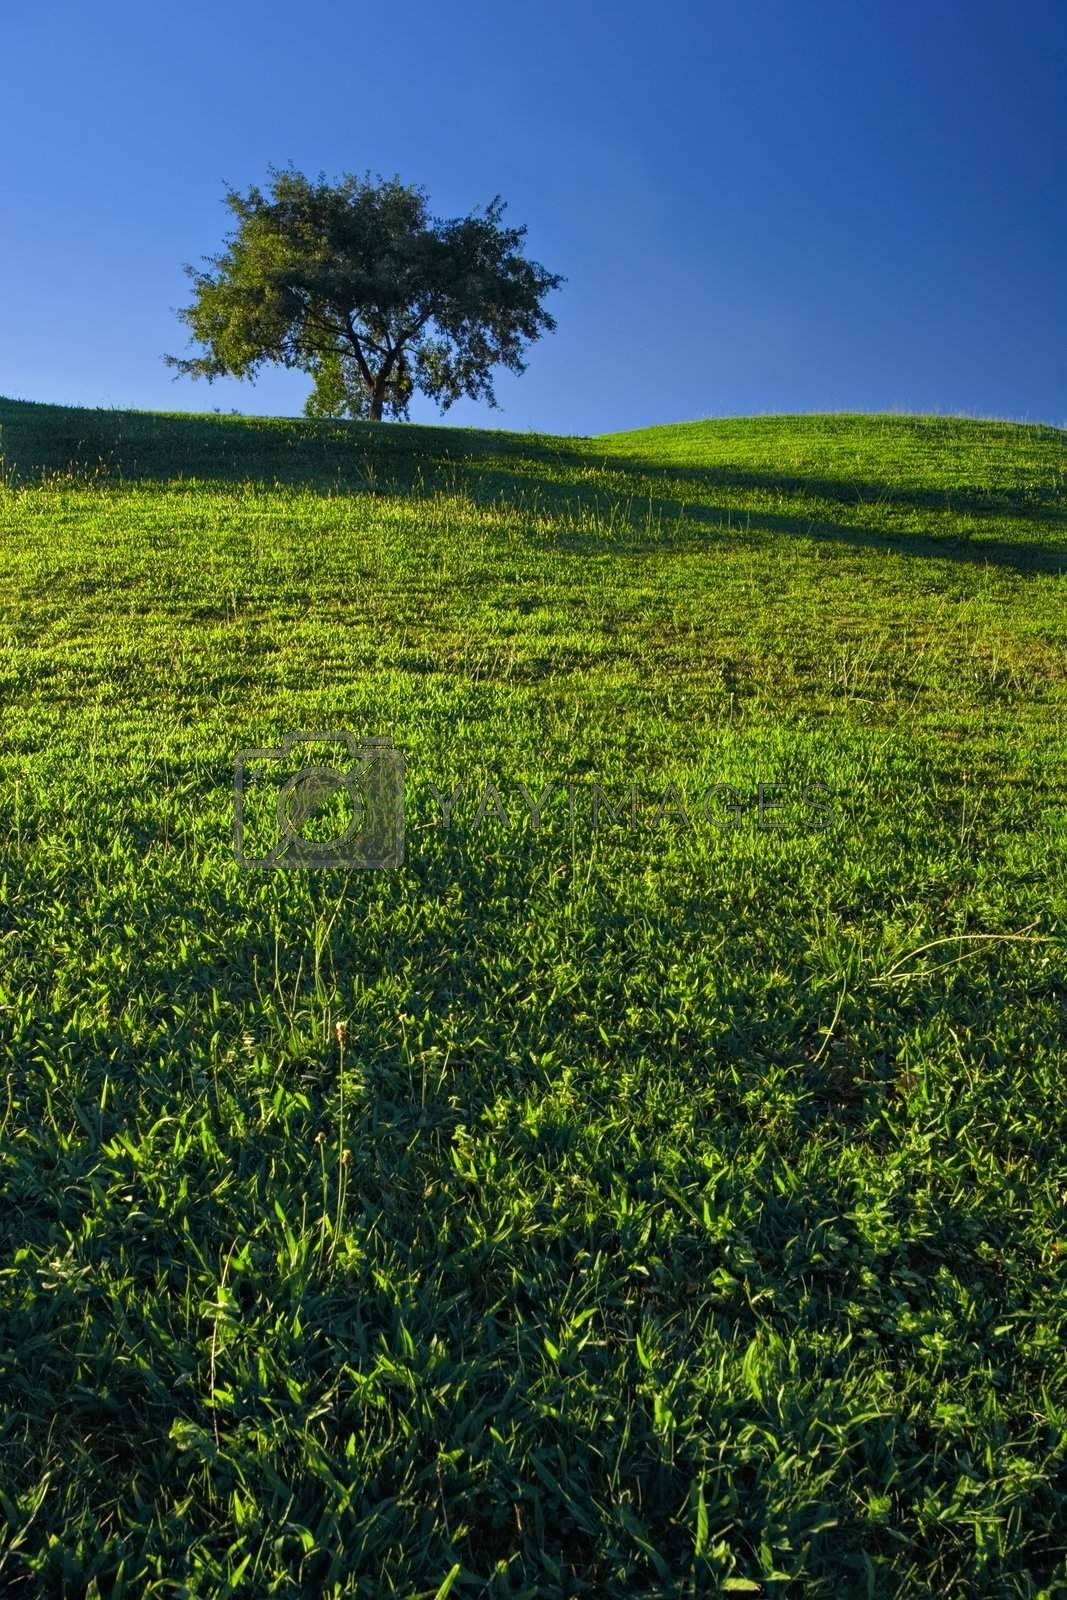 Tree on Grassland with deep blue sky.